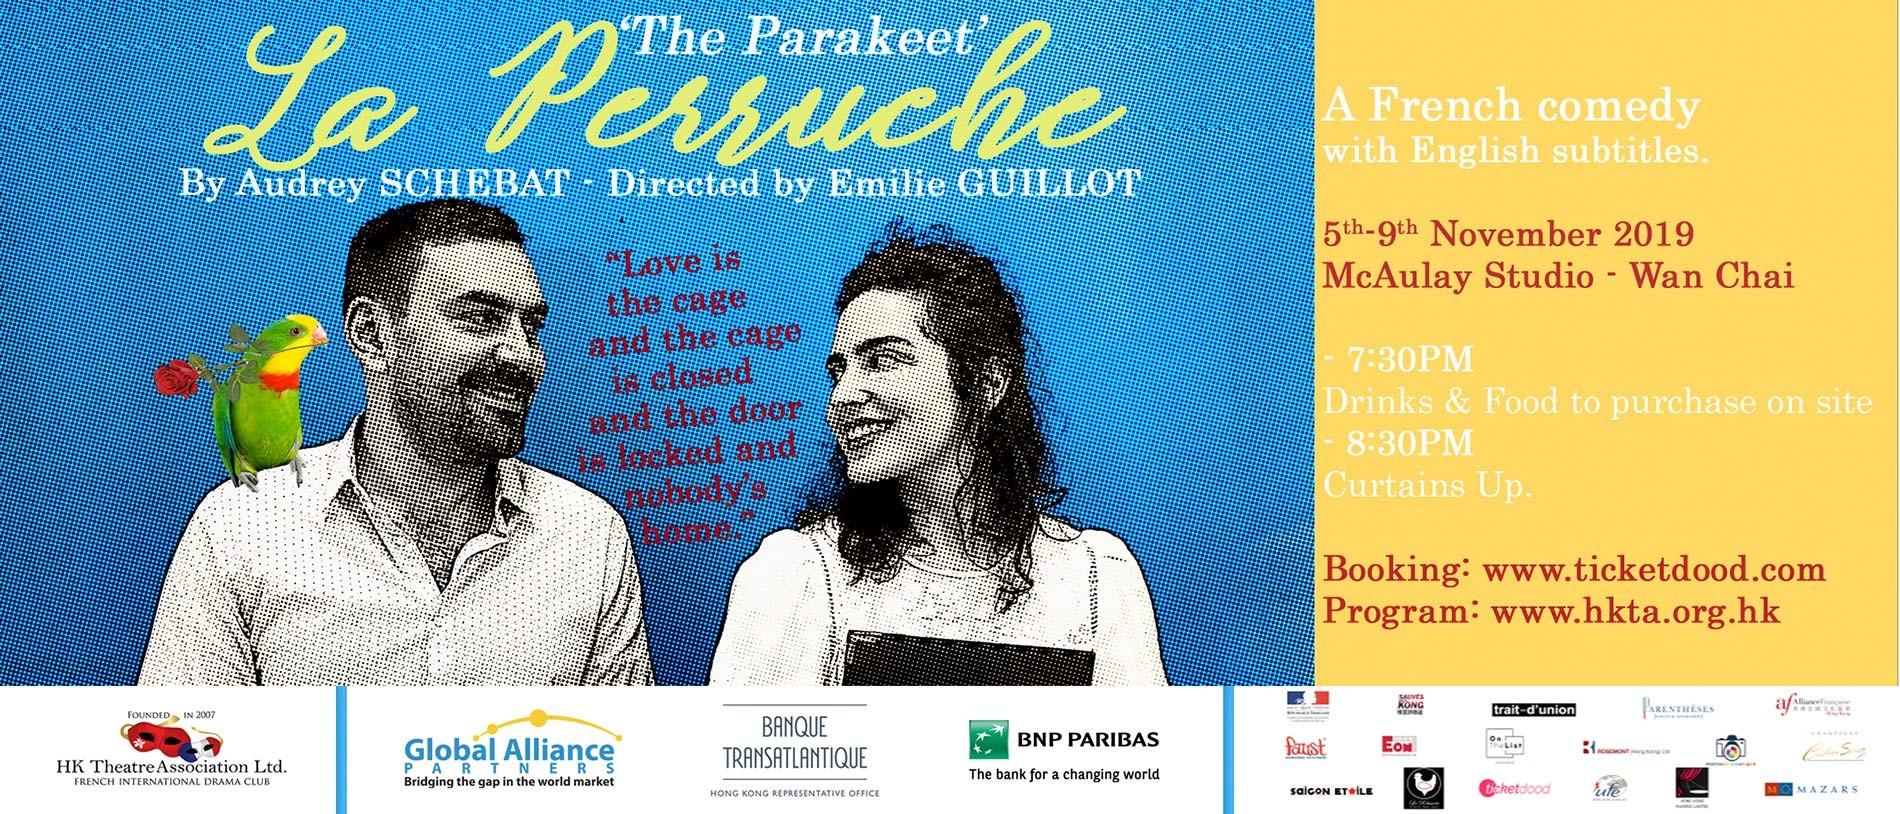 La Perruche – The Parakeet